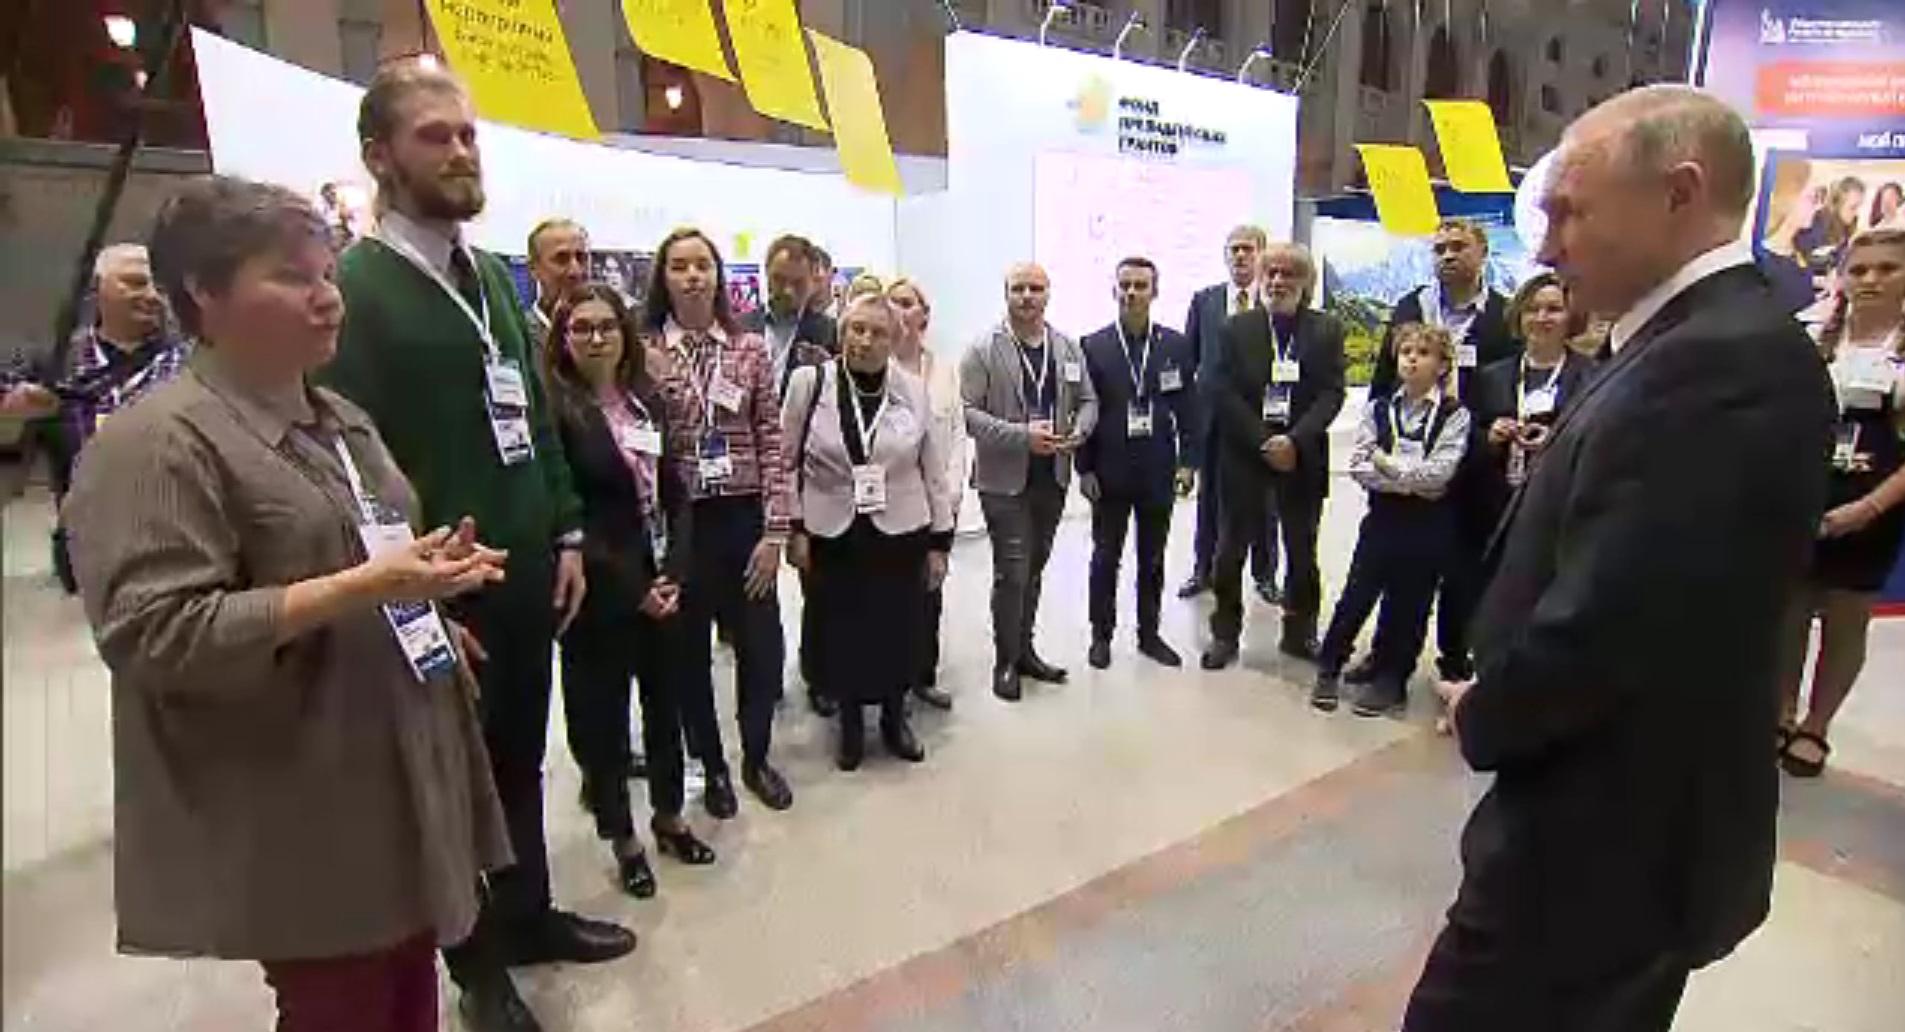 Владимир Путин похвалил проект самарцев